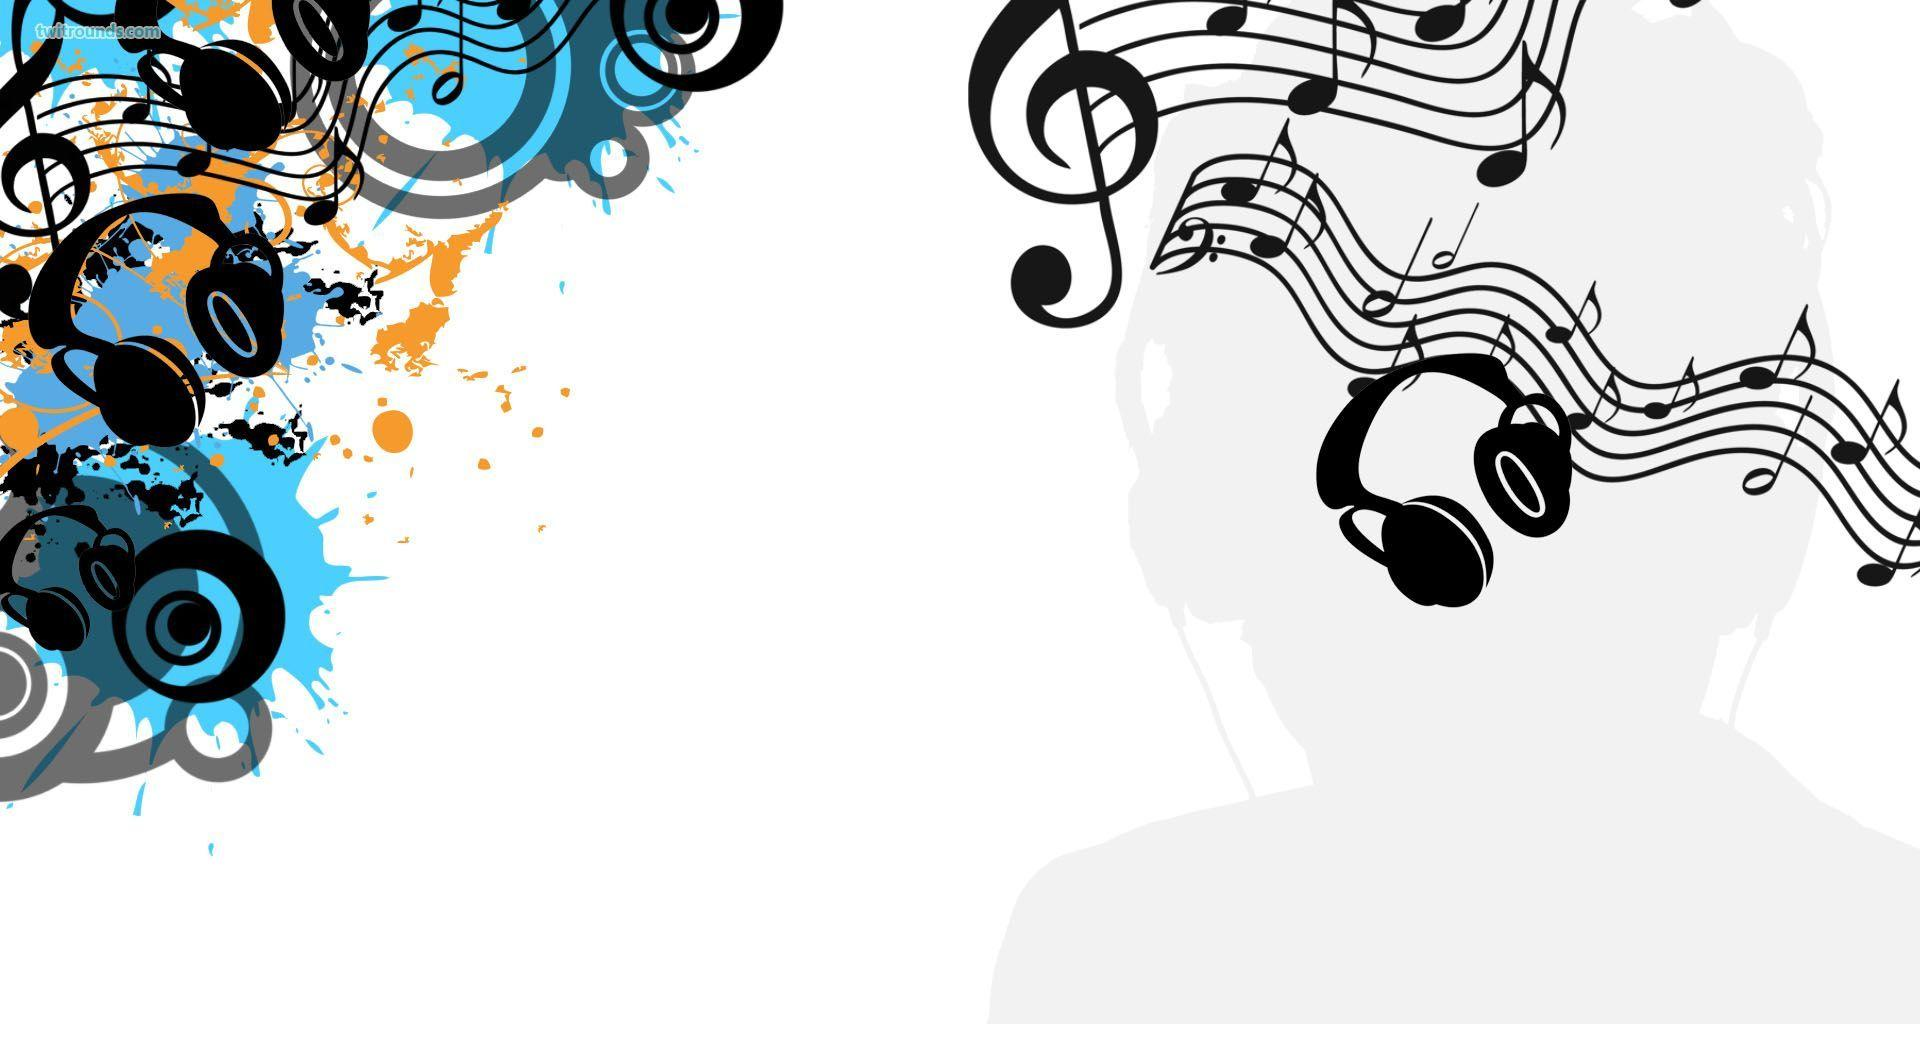 Cool music backgrounds wallpapers wallpaper cave - Wallpaper artist music ...